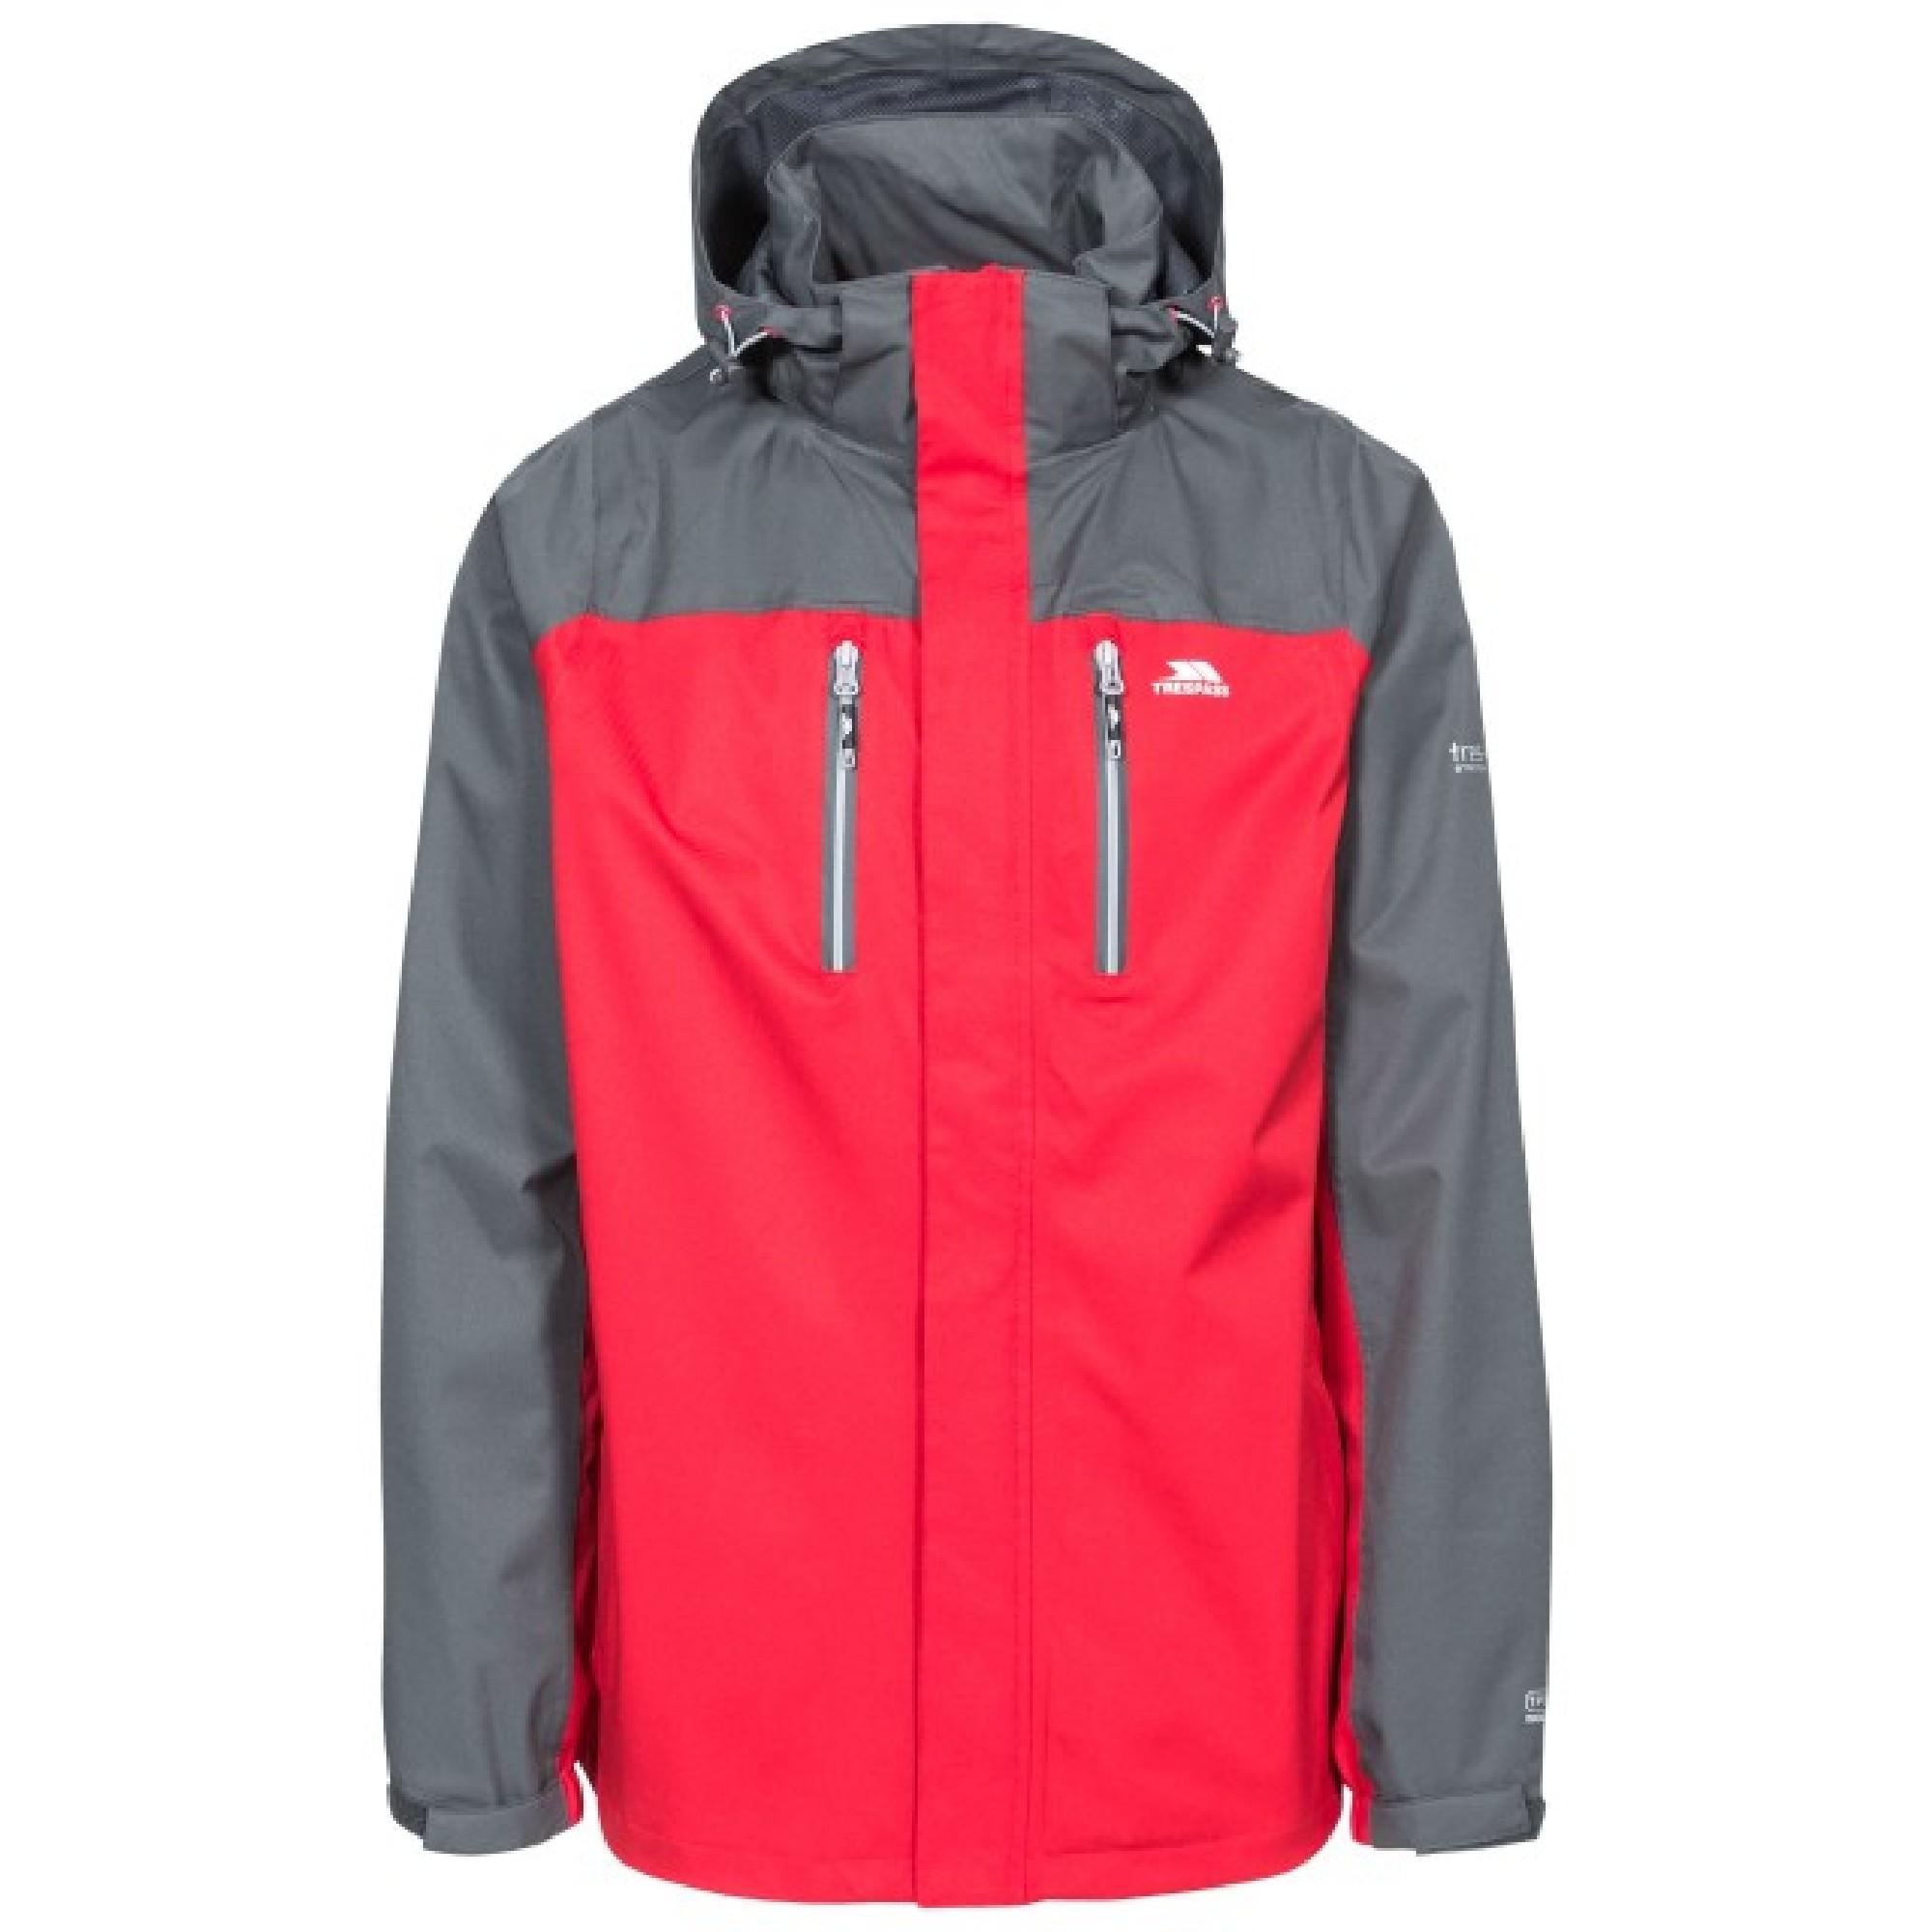 Trespass-Mens-Wooster-Waterproof-Jacket-TP4064